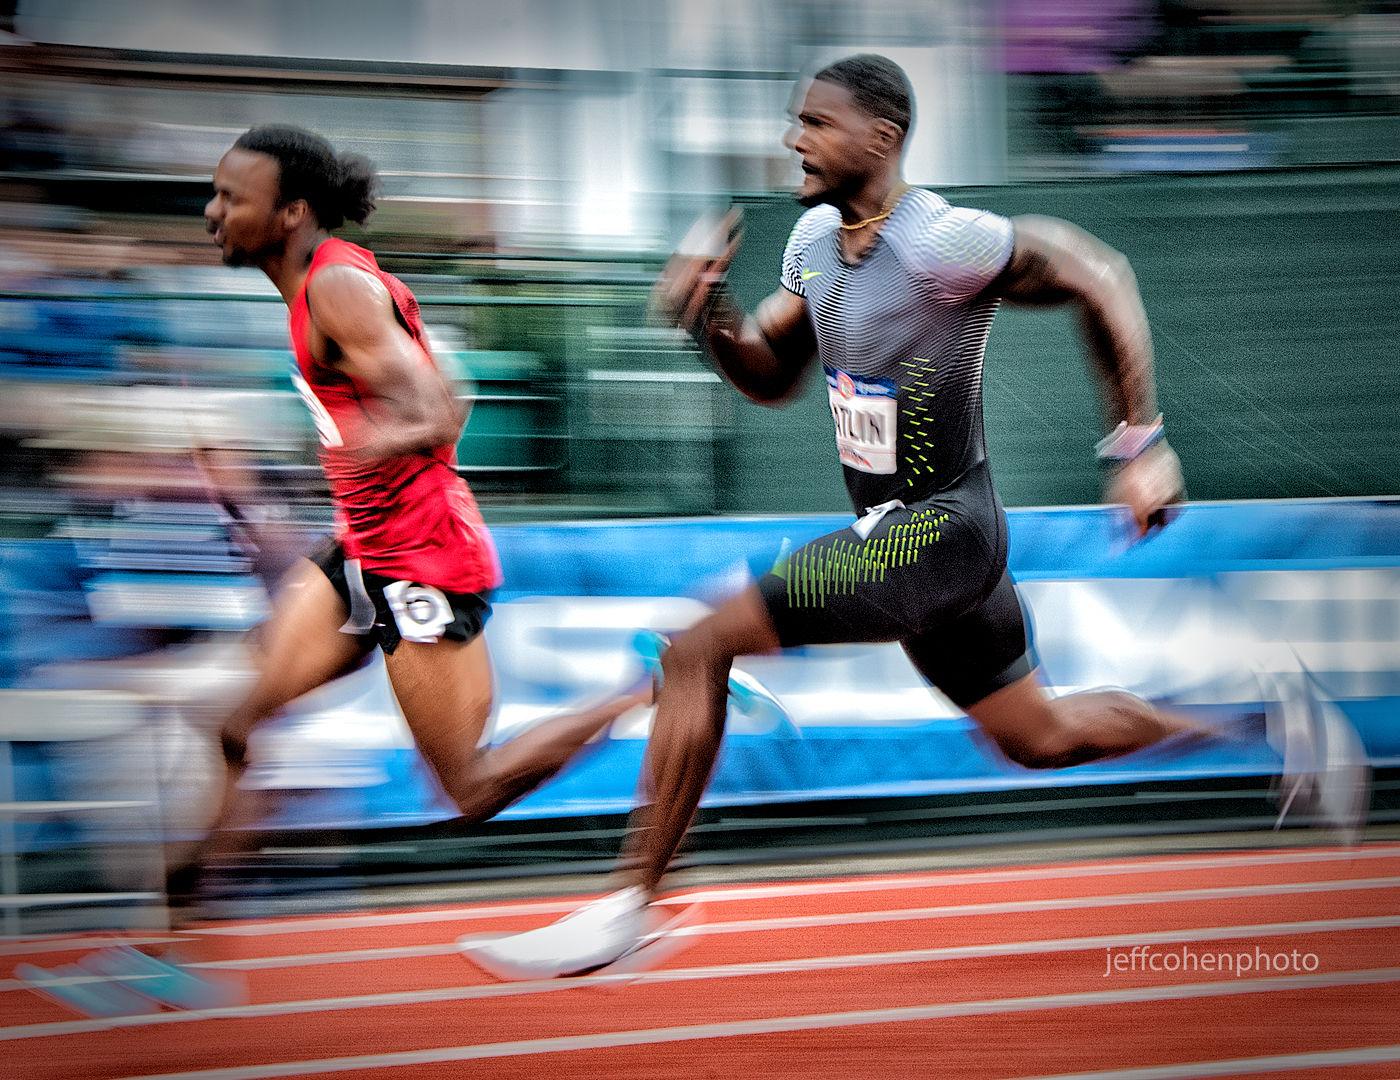 1r2016_oly_trials_day_6_gatlin_200_blur_jeff_cohen_photo_20763_web.jpg